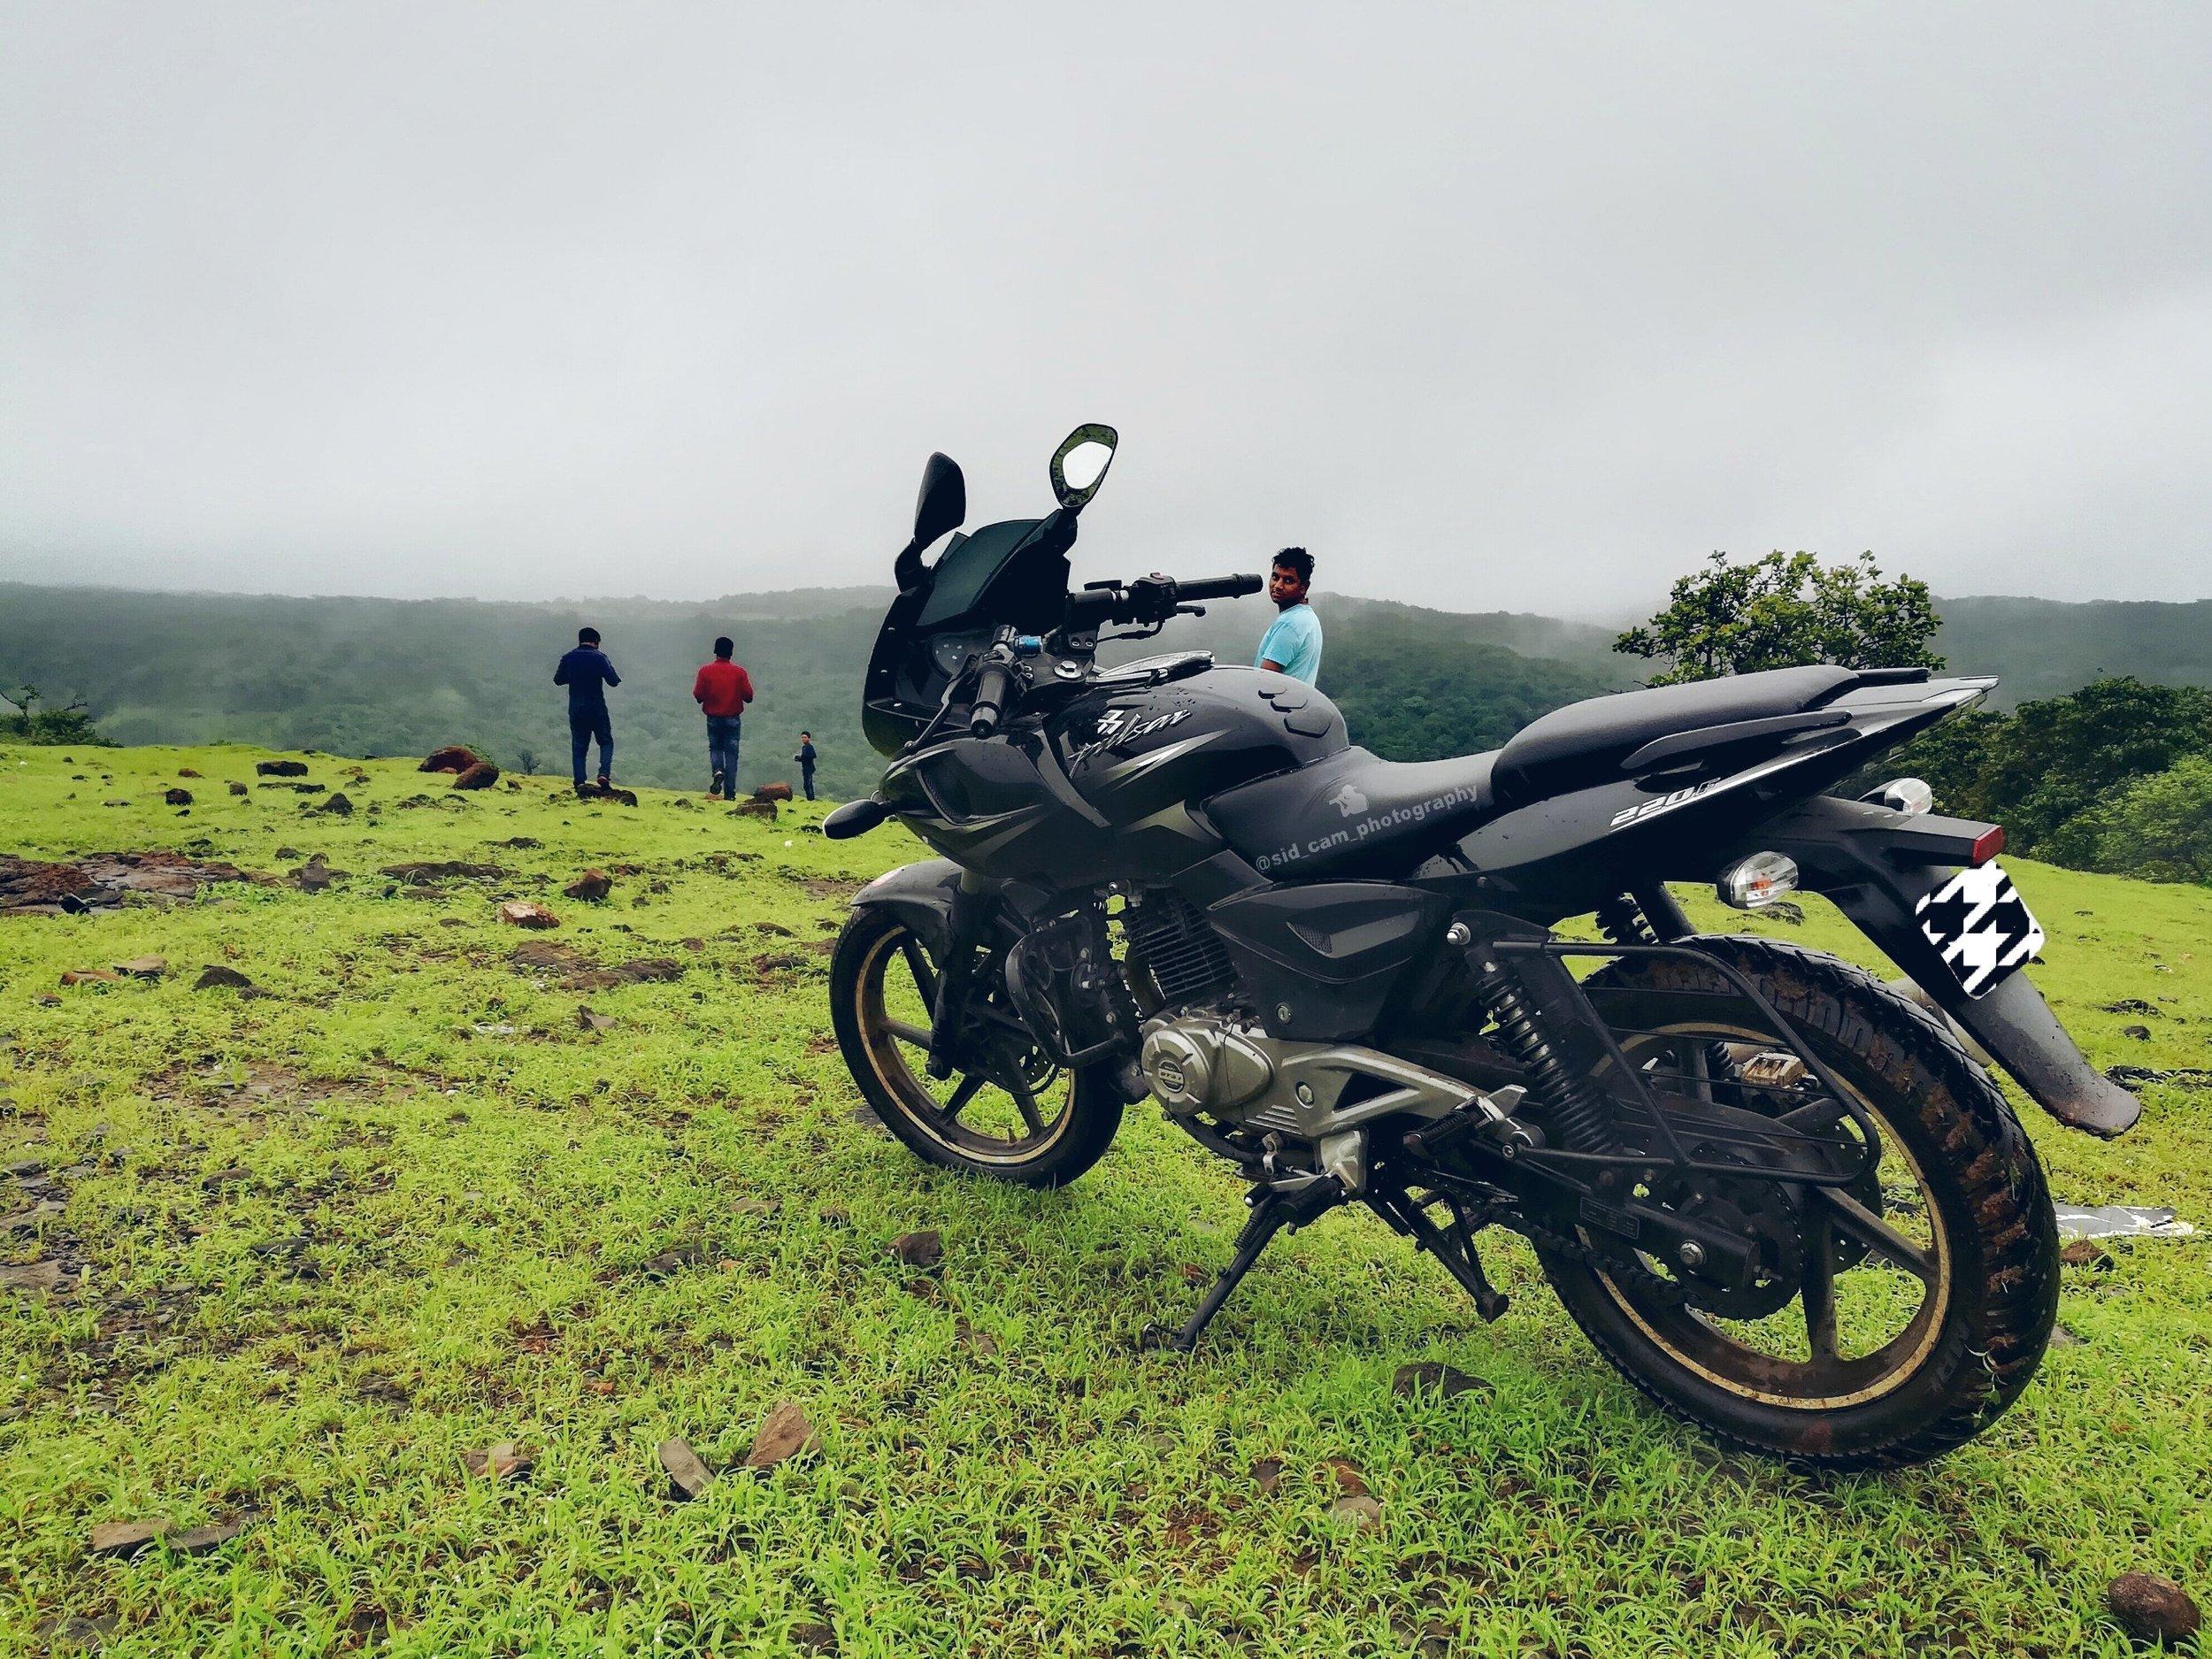 adventure-biker-daylight-978249.jpg